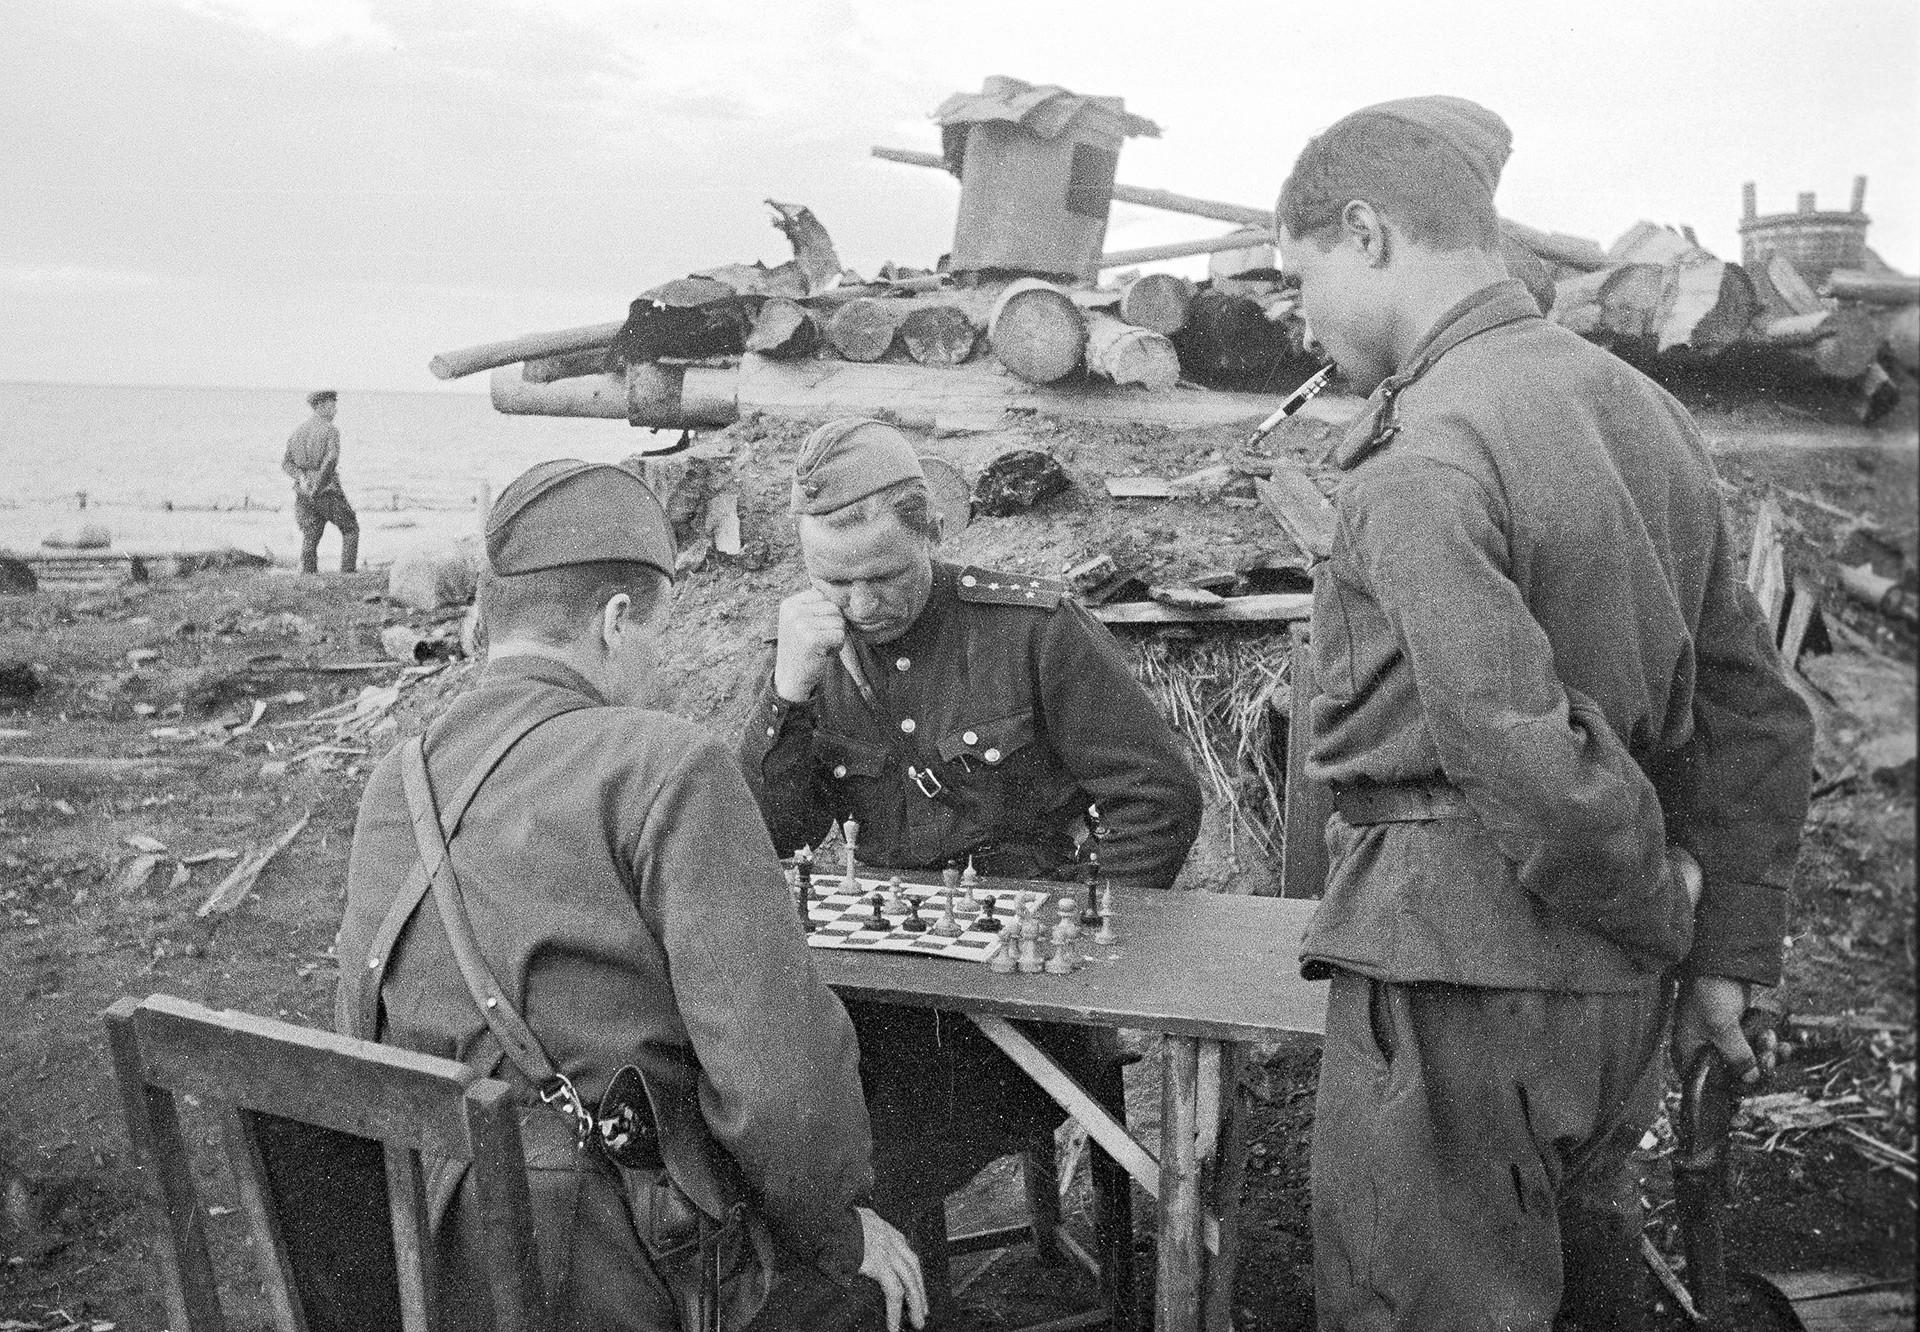 Partija šaha na obali jezera Iljmenj, 1943.